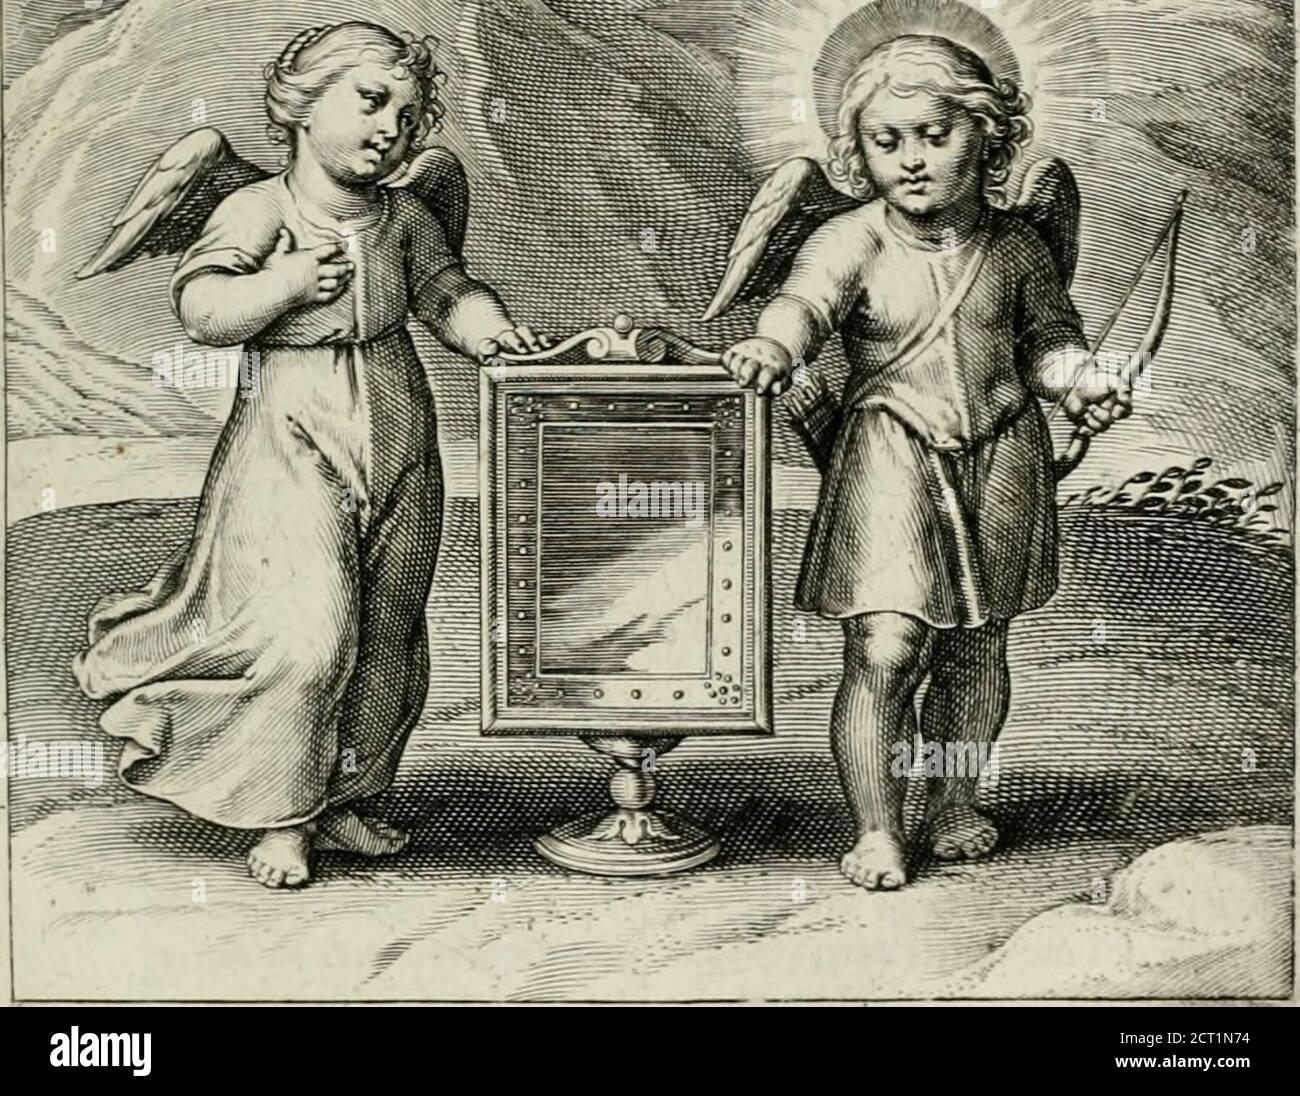 . Amoris divini emblemata . ndum crea in me Deus,&: Fpiricum reduminnoua in visceribus meis. Pulchraes amica mea, & macula non eft in te. Si Deo aliquid diligendo vel pnponimiis vel arqua-mus,nos ipfos diligcre nefcimiis. Meno Domine te amat, qui aliquid tecum amar, quod propter te non amat. Non posso. 4. Augufl. In Idem iaConfejf. Es Amor vn claro efpejo.en cuyo limpio cri Halse vè Dios al natural. GElijck cen fpieghel fchoon en klaer i Ç ^ tiiroir iia Plus degrxceMoet de verliefde fíele wefen, 1 vj pour eílrc en vn endroiñt, loet de verliefde fíele wefen,Gantfch fonder vleck,en dat-men daeroh Maf Foto Stock